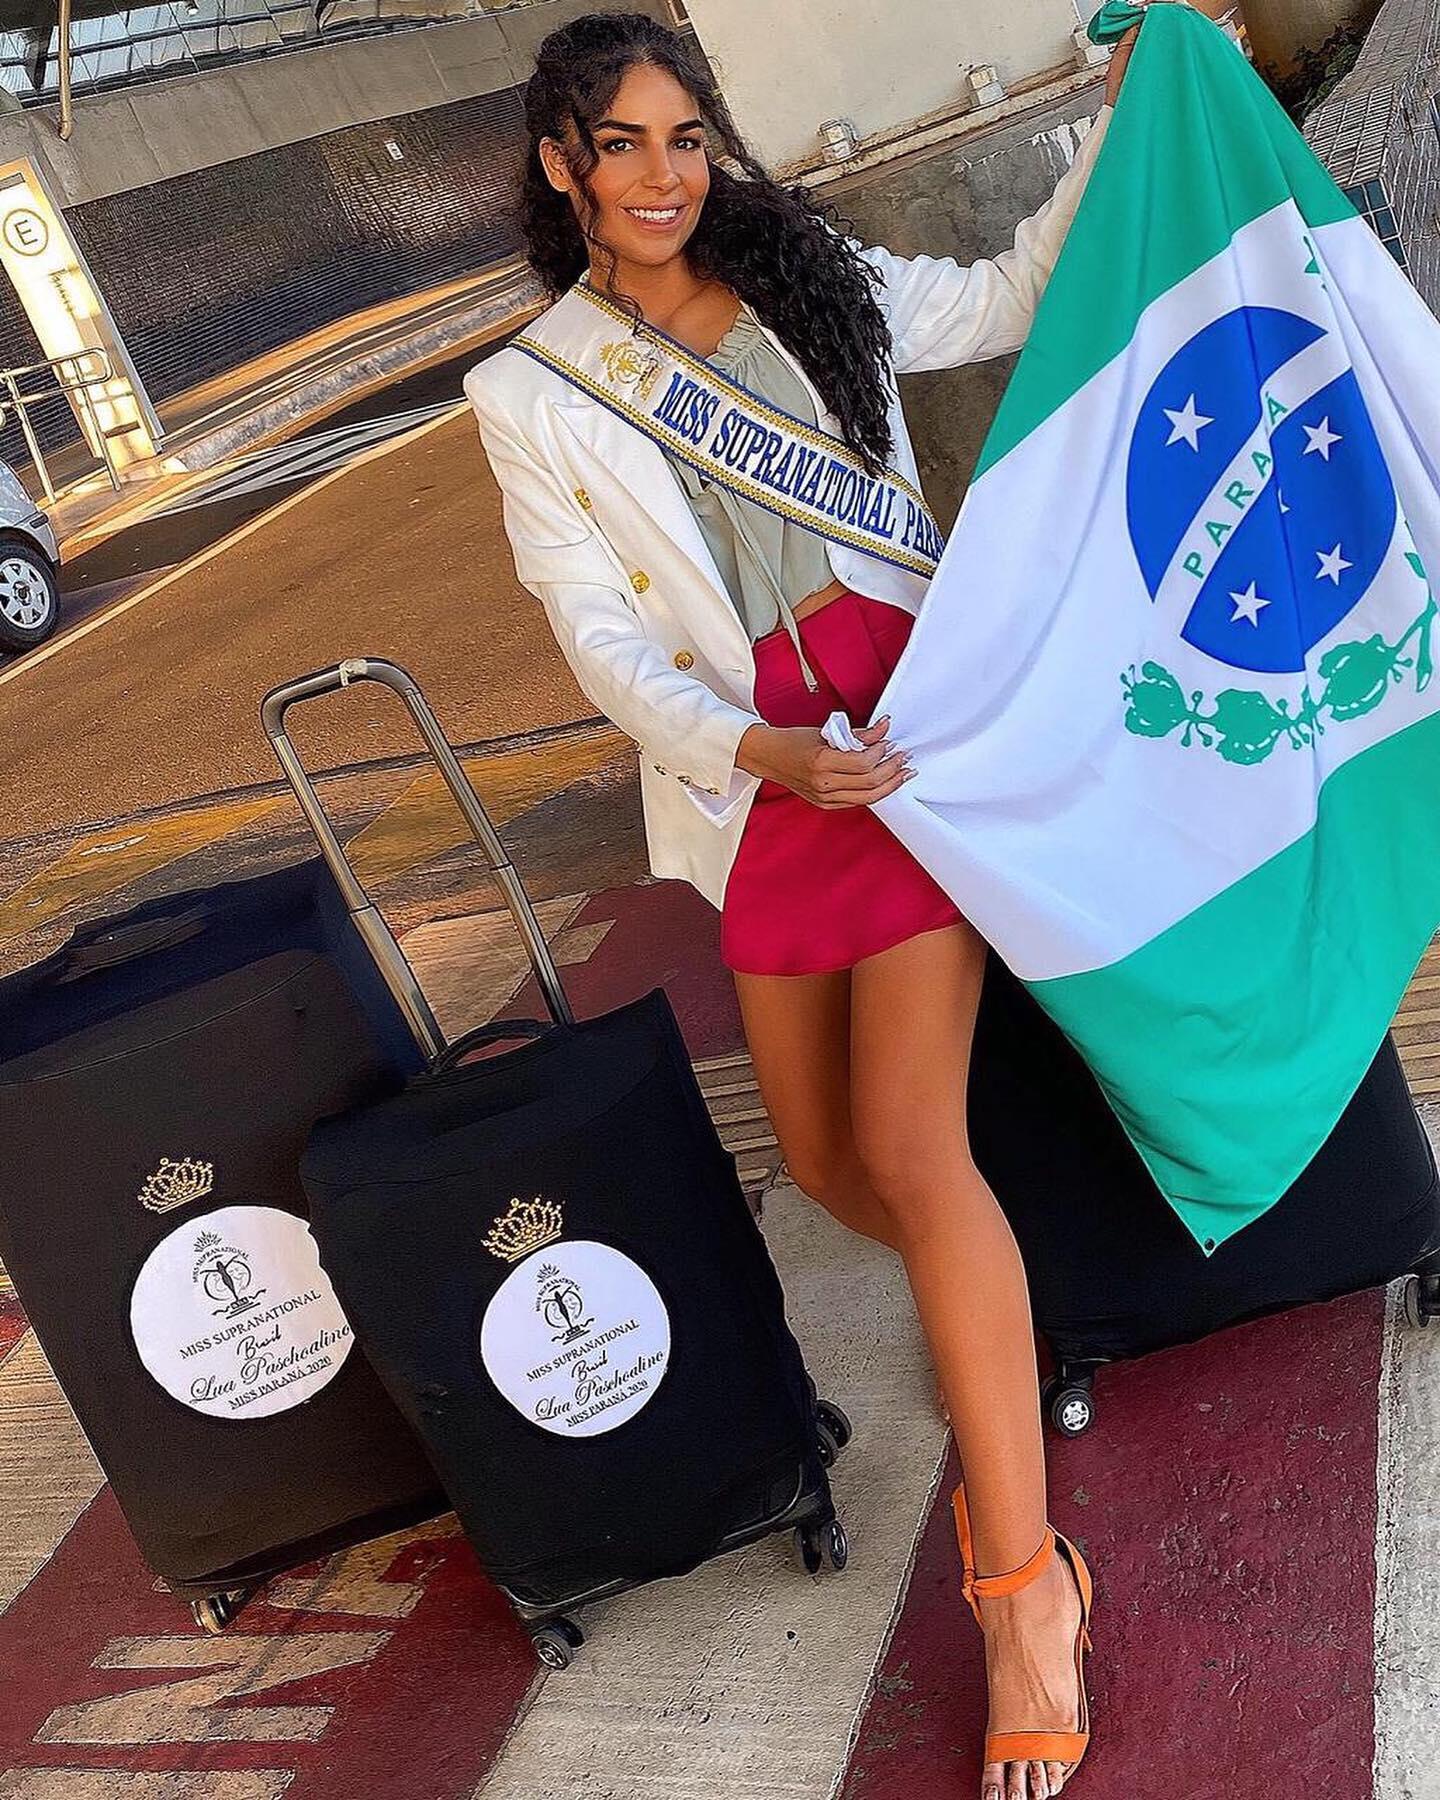 lua paschoalino, miss supranational parana 2020. - Página 4 12781610